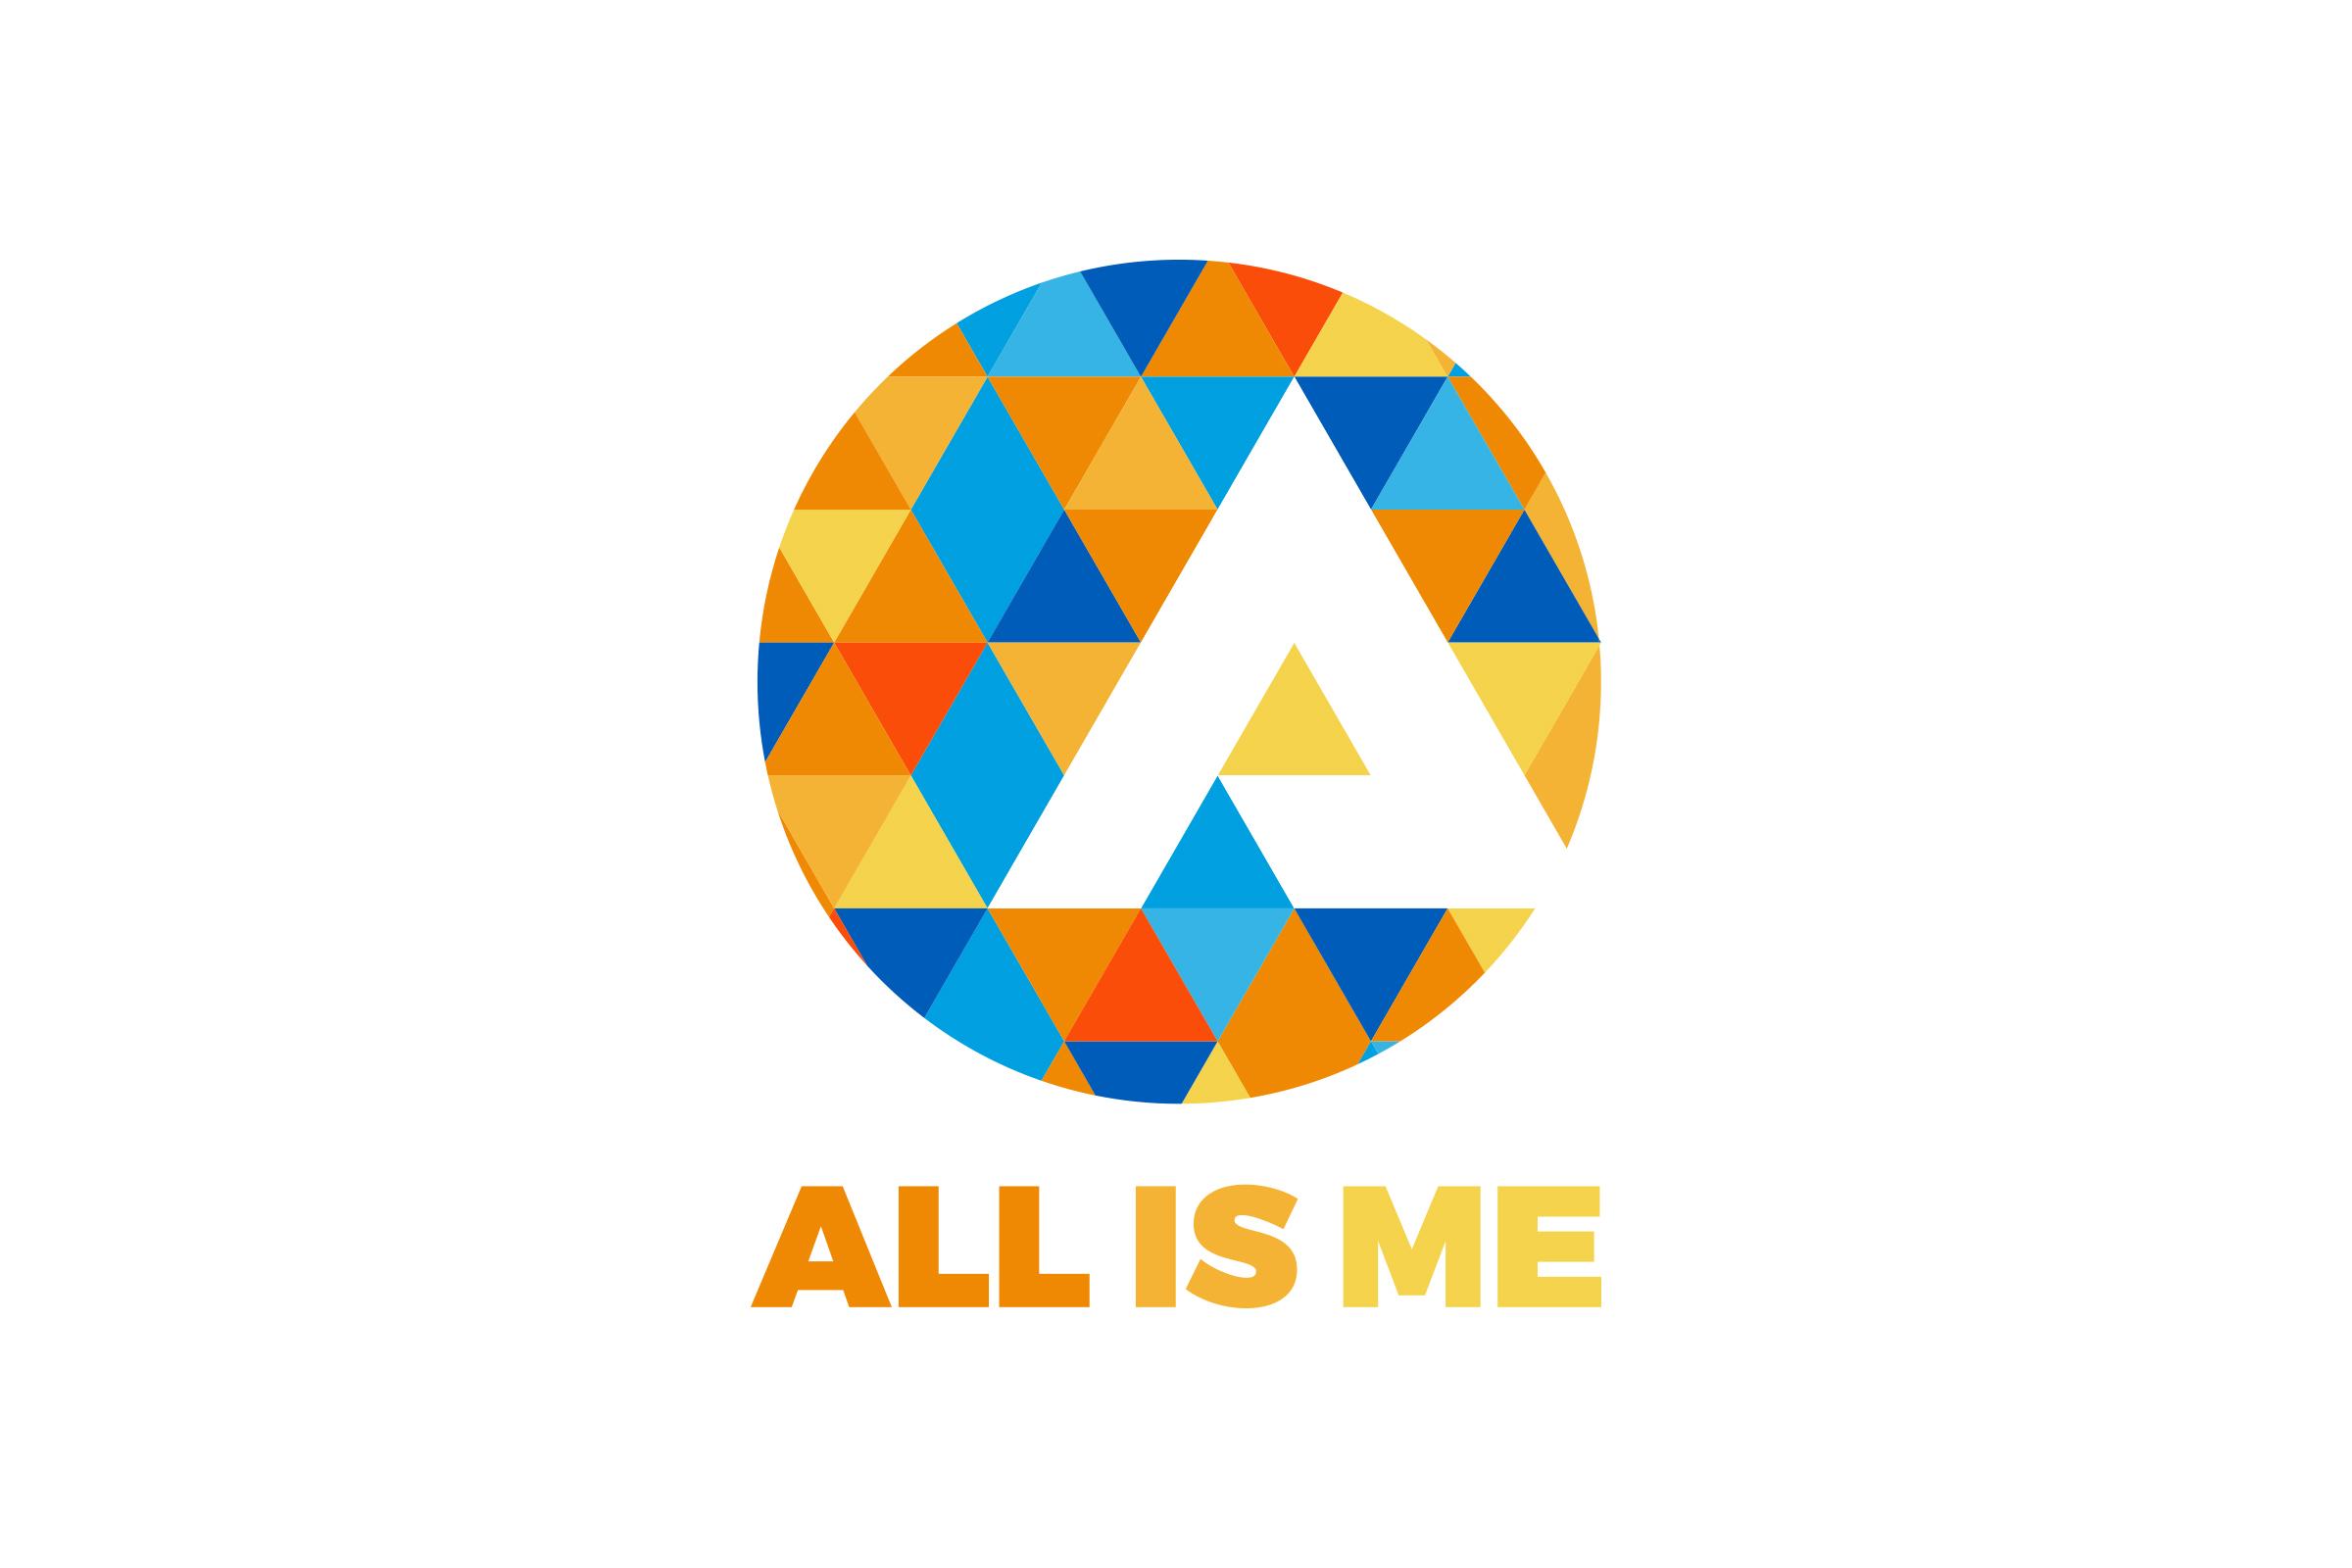 hearthfire-creative-logo-brand-identity-designer-denver-colorado-all-is-me-1.jpg